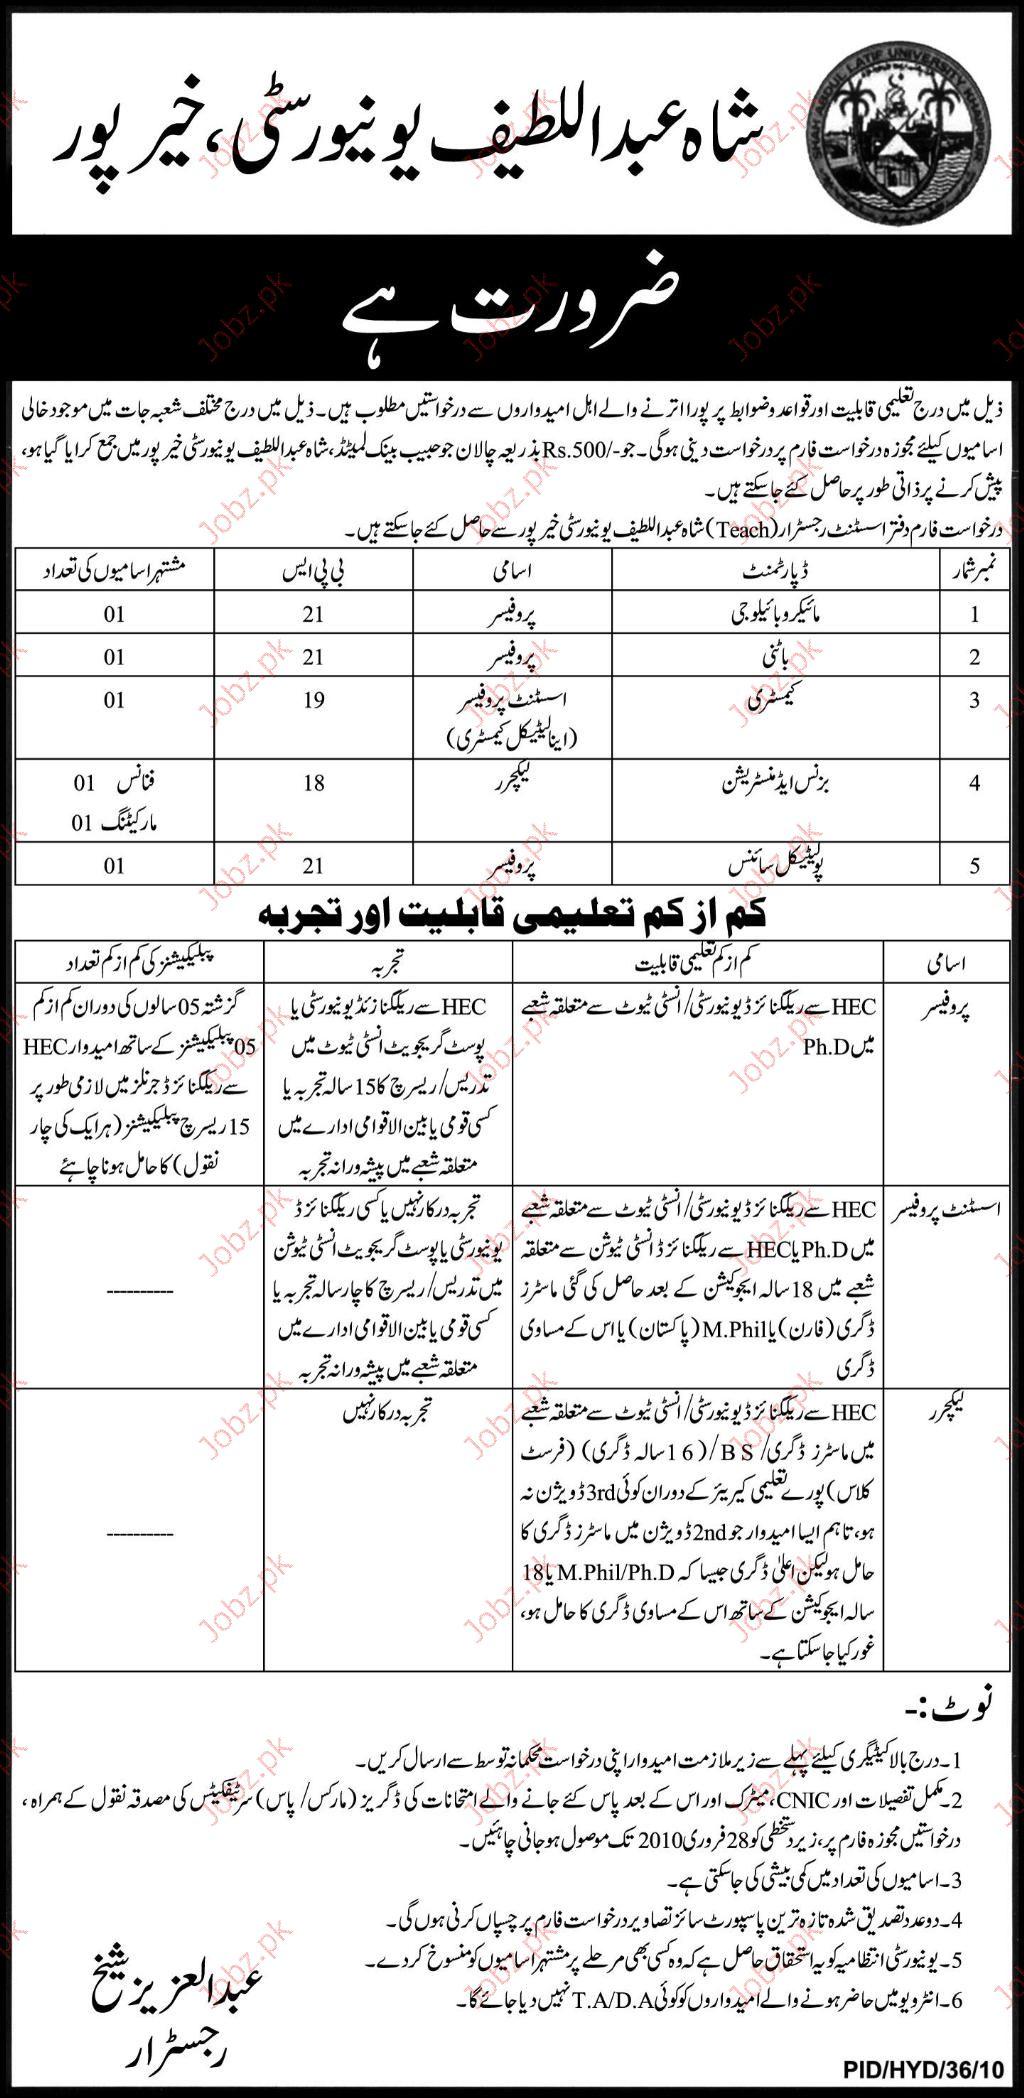 Shah Abdul Latif University Job Opportunities